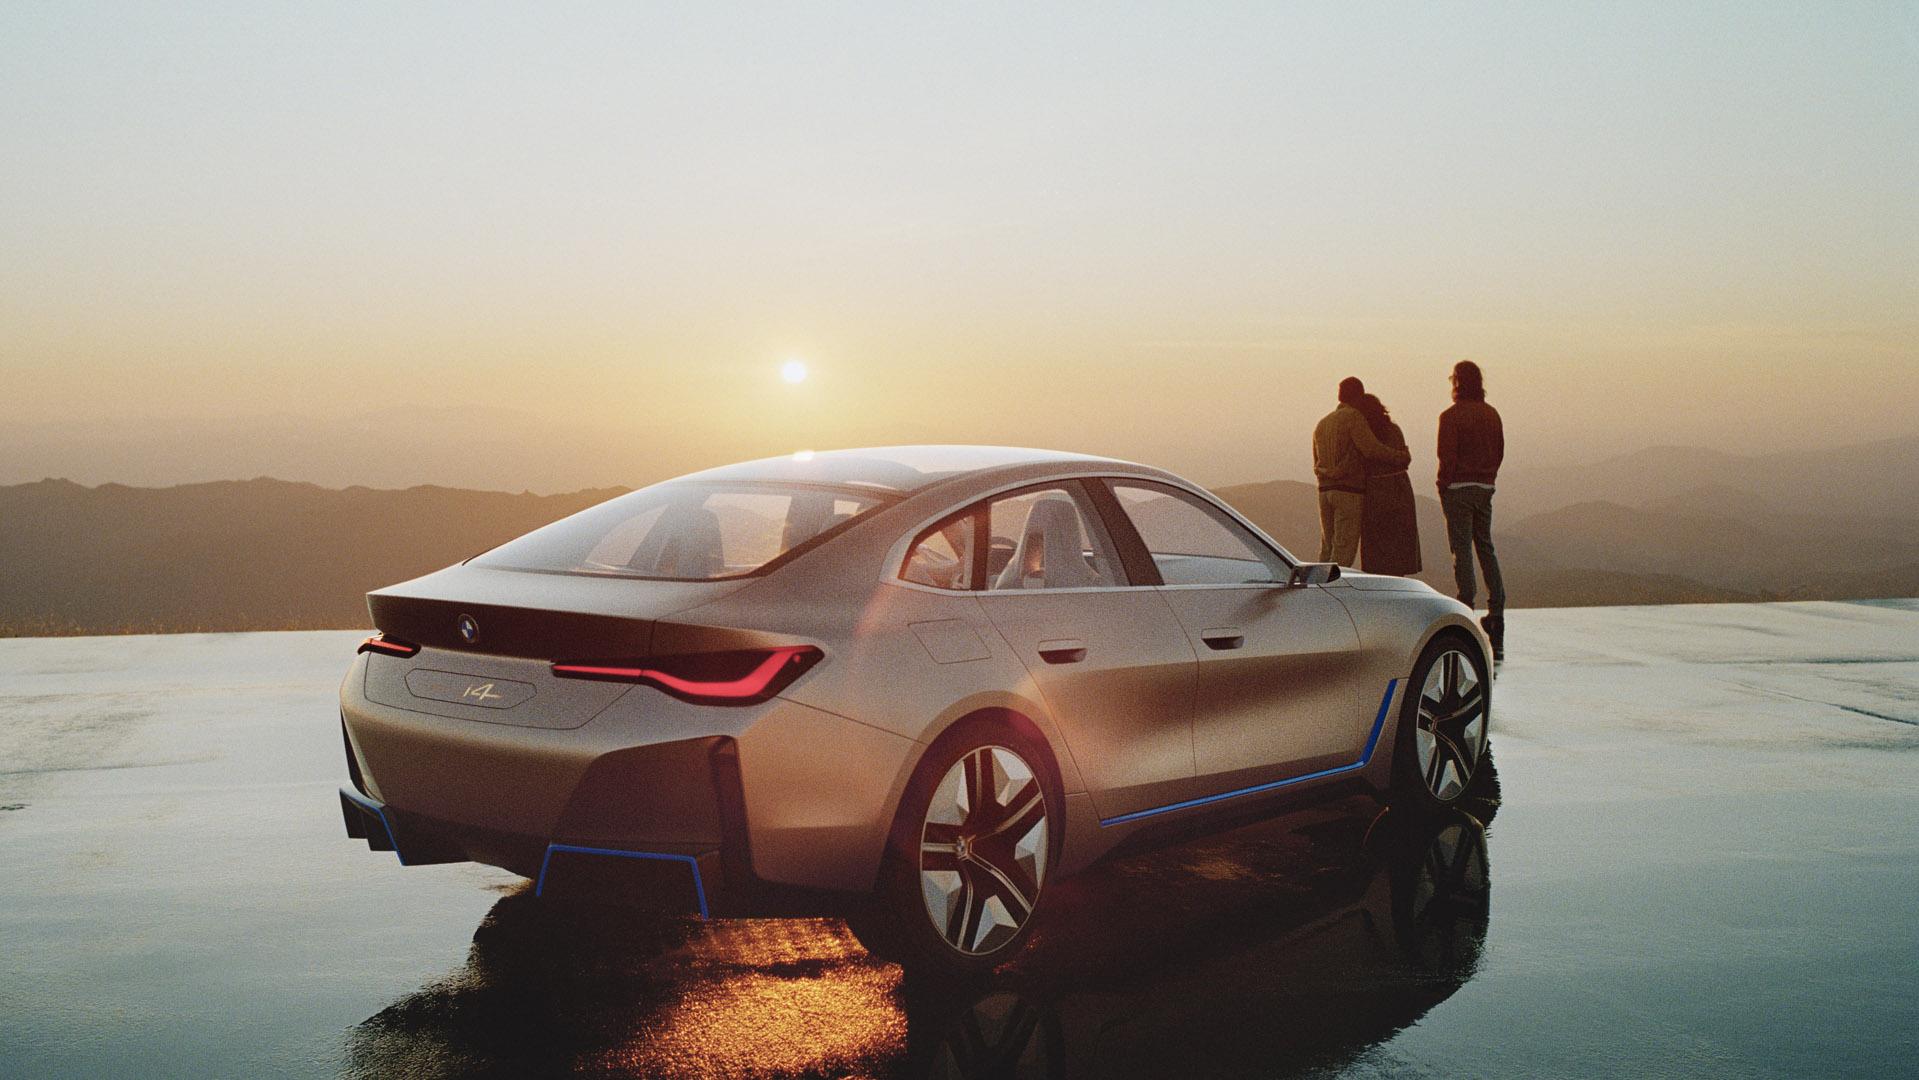 BMW Concept i4 electric